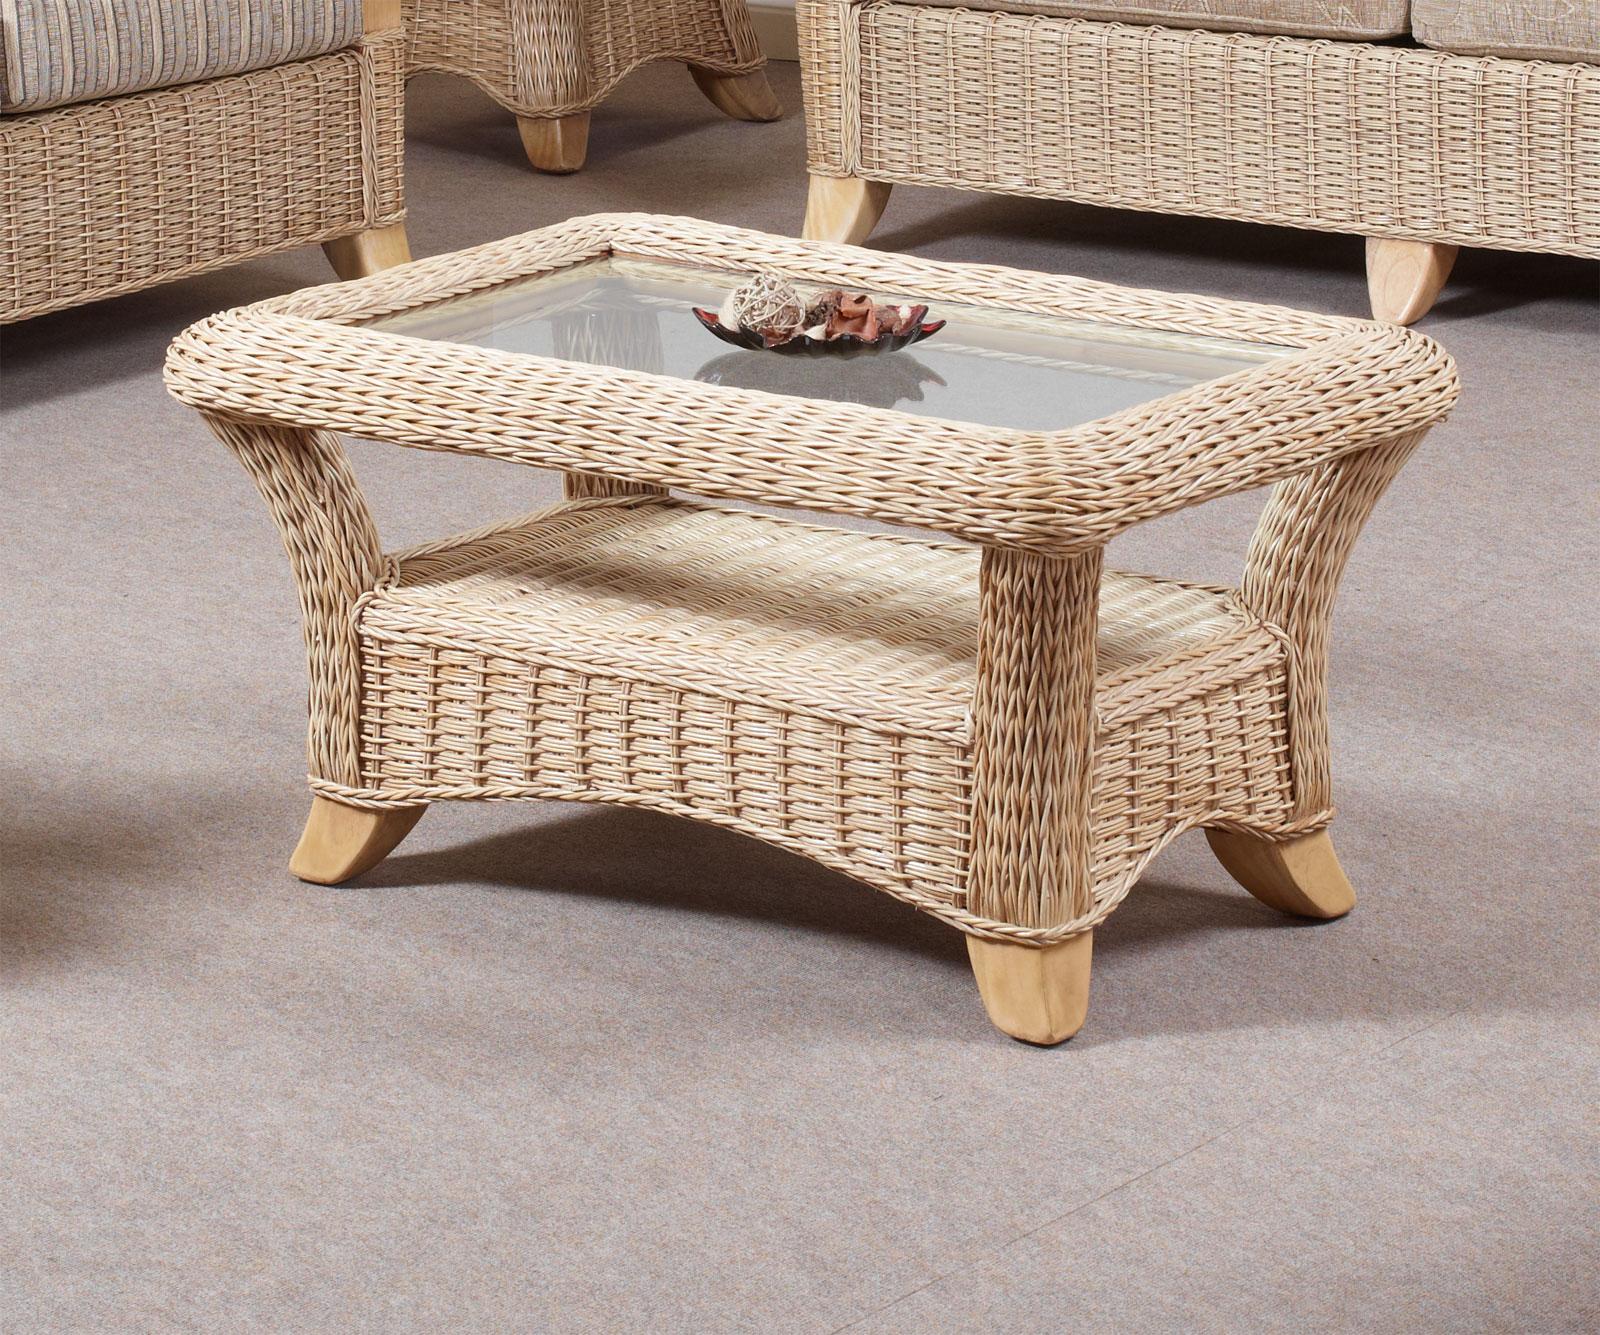 Hilton Conservatory Cane Furniture